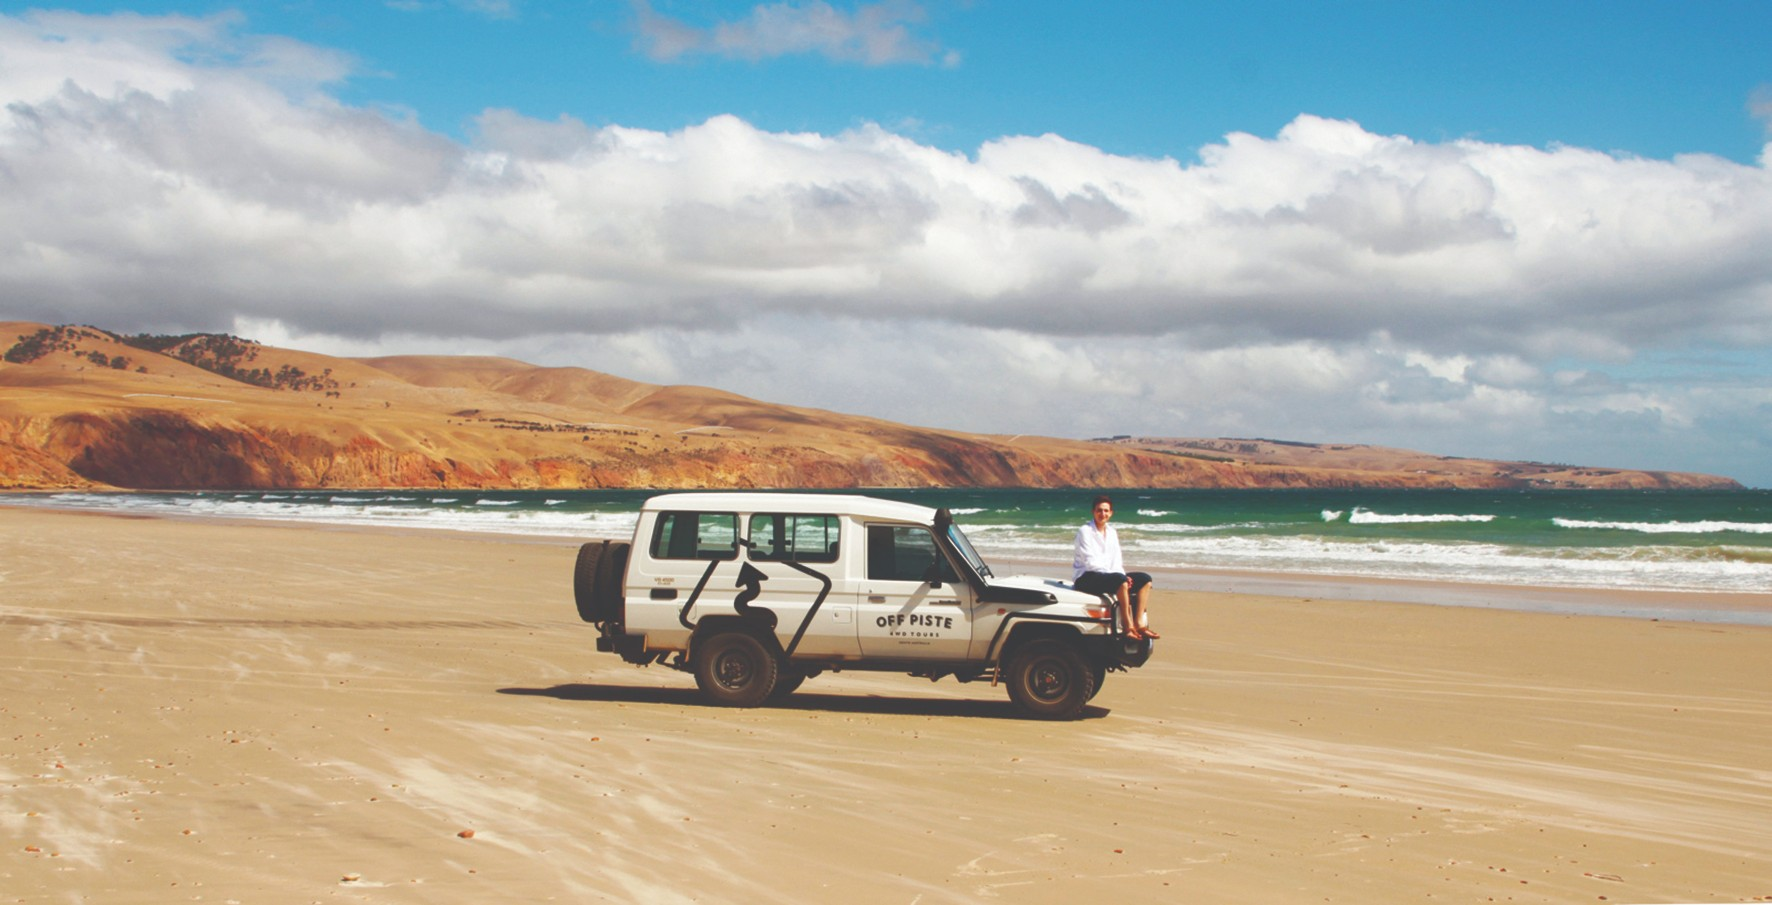 The Gold List 2020 Best International Destination — Adelaide, South Australia